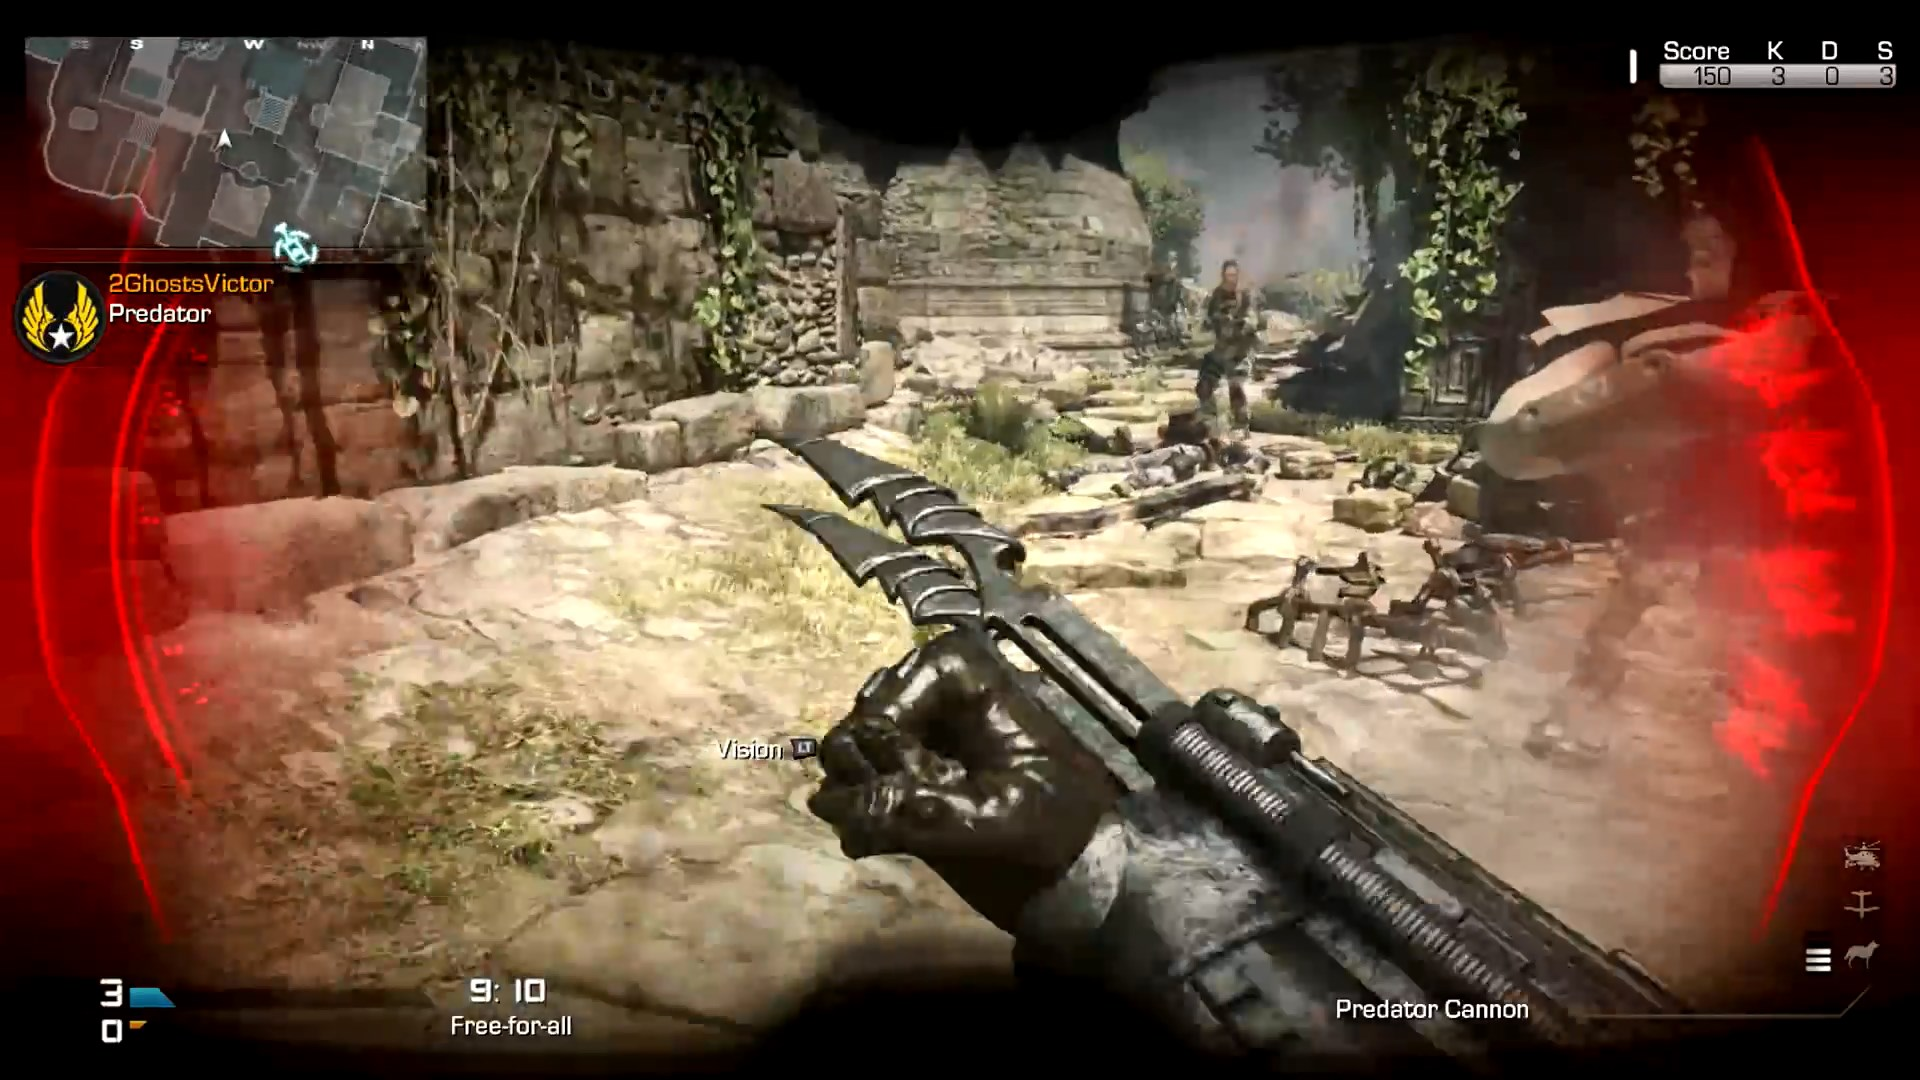 Call Of Duty Ghosts Devastation Dlc Features Predator